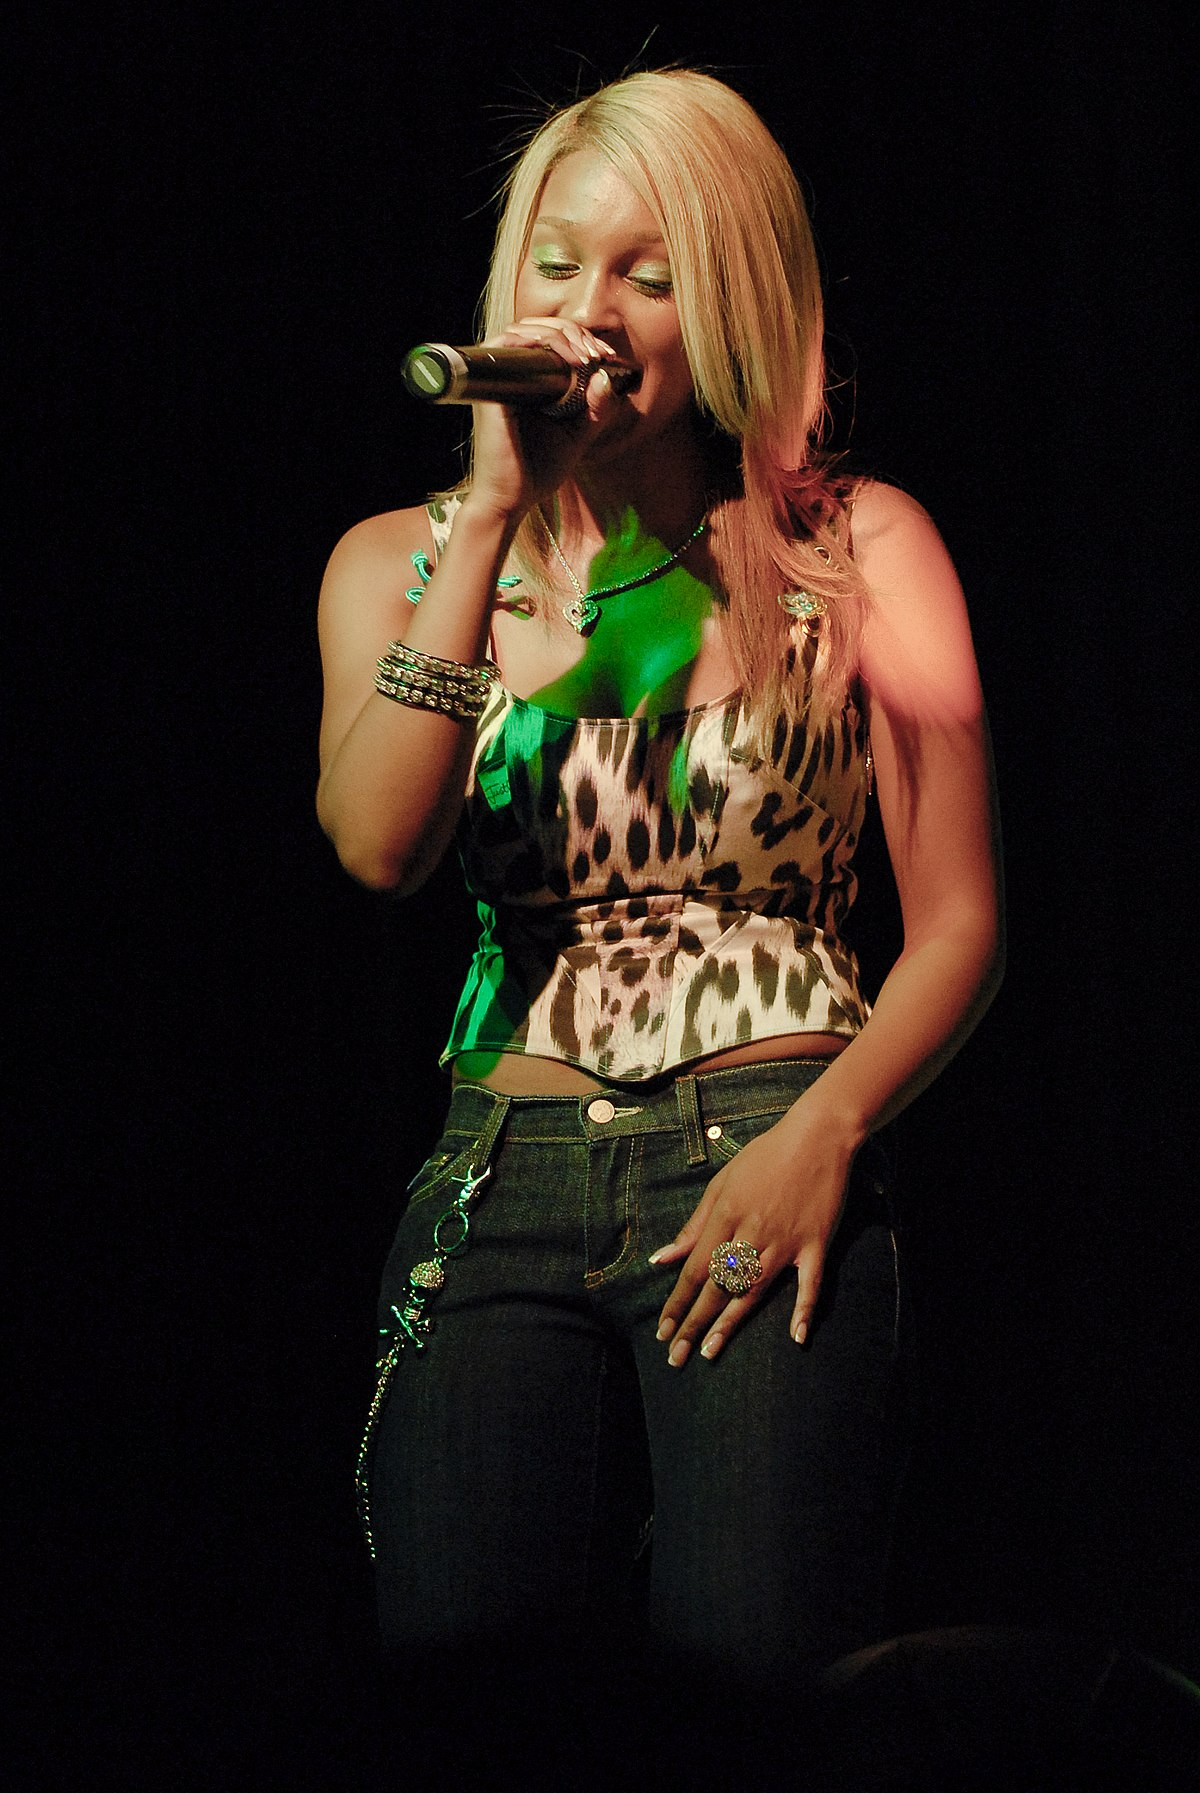 Olivia (singer)